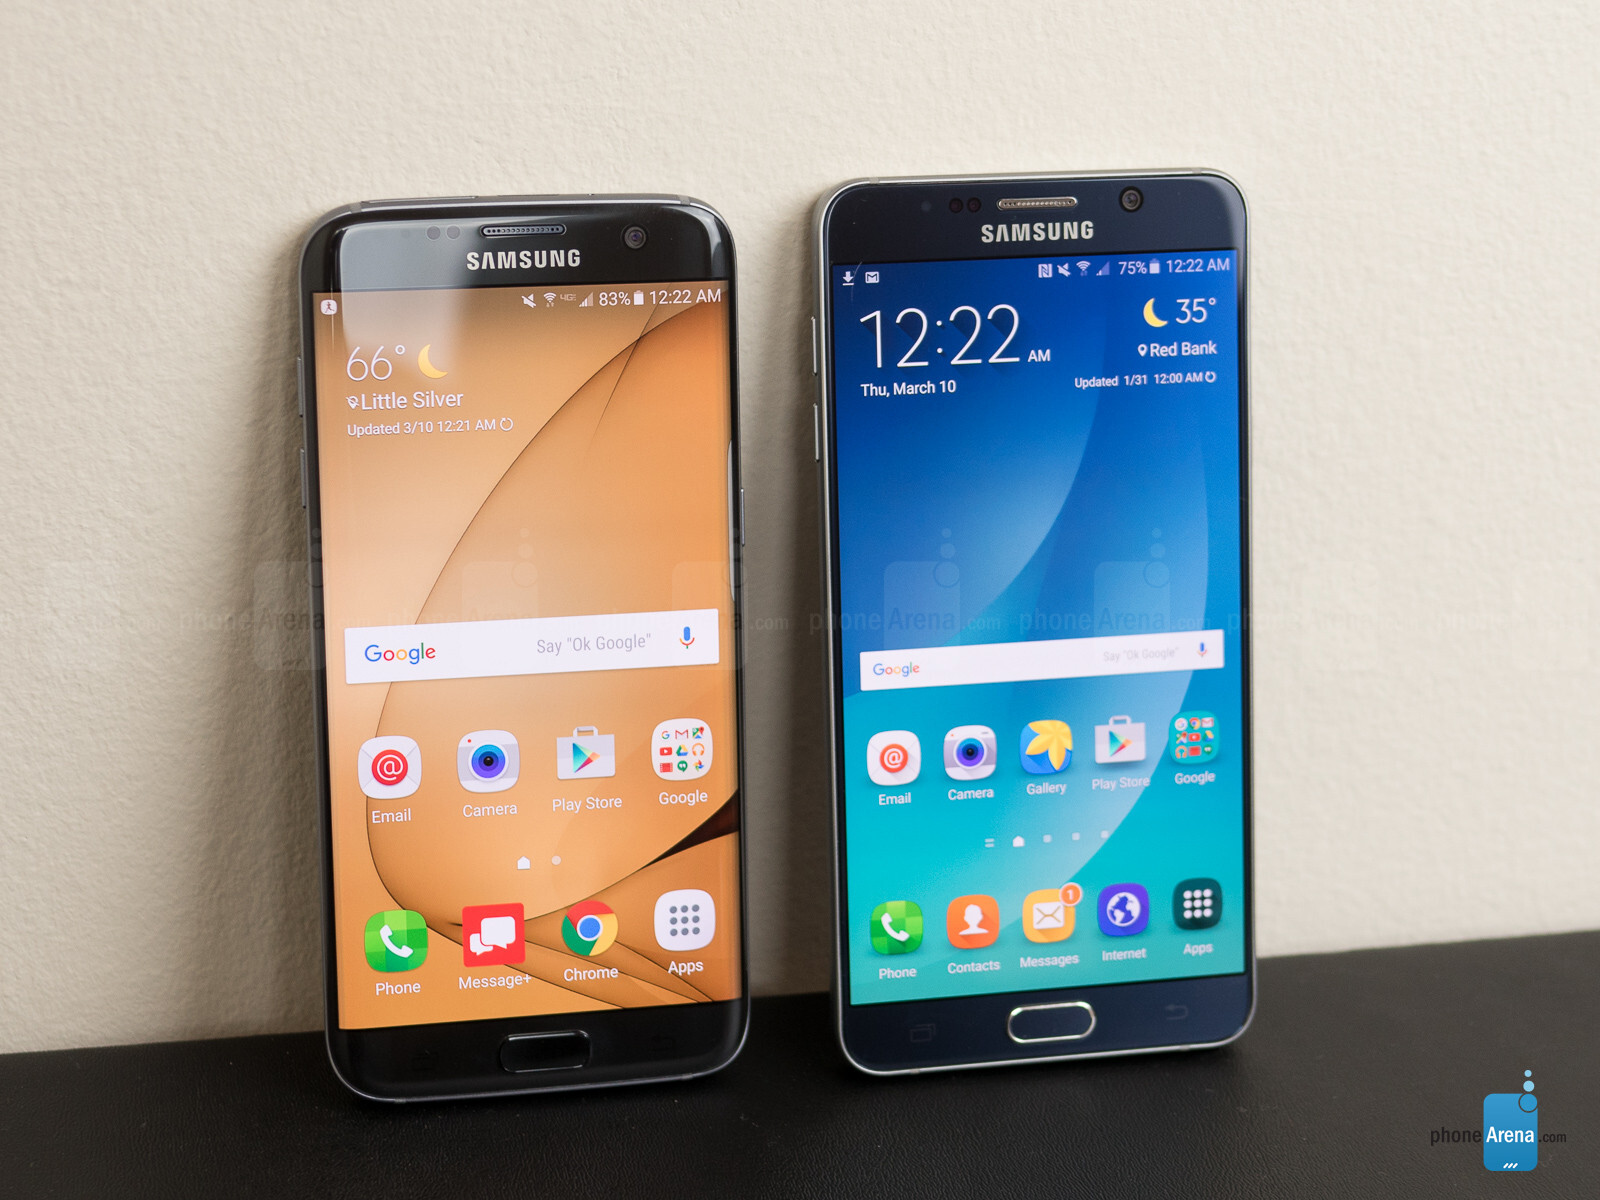 Samsung Galaxy V: Samsung Galaxy S7 Edge Vs Samsung Galaxy Note 5